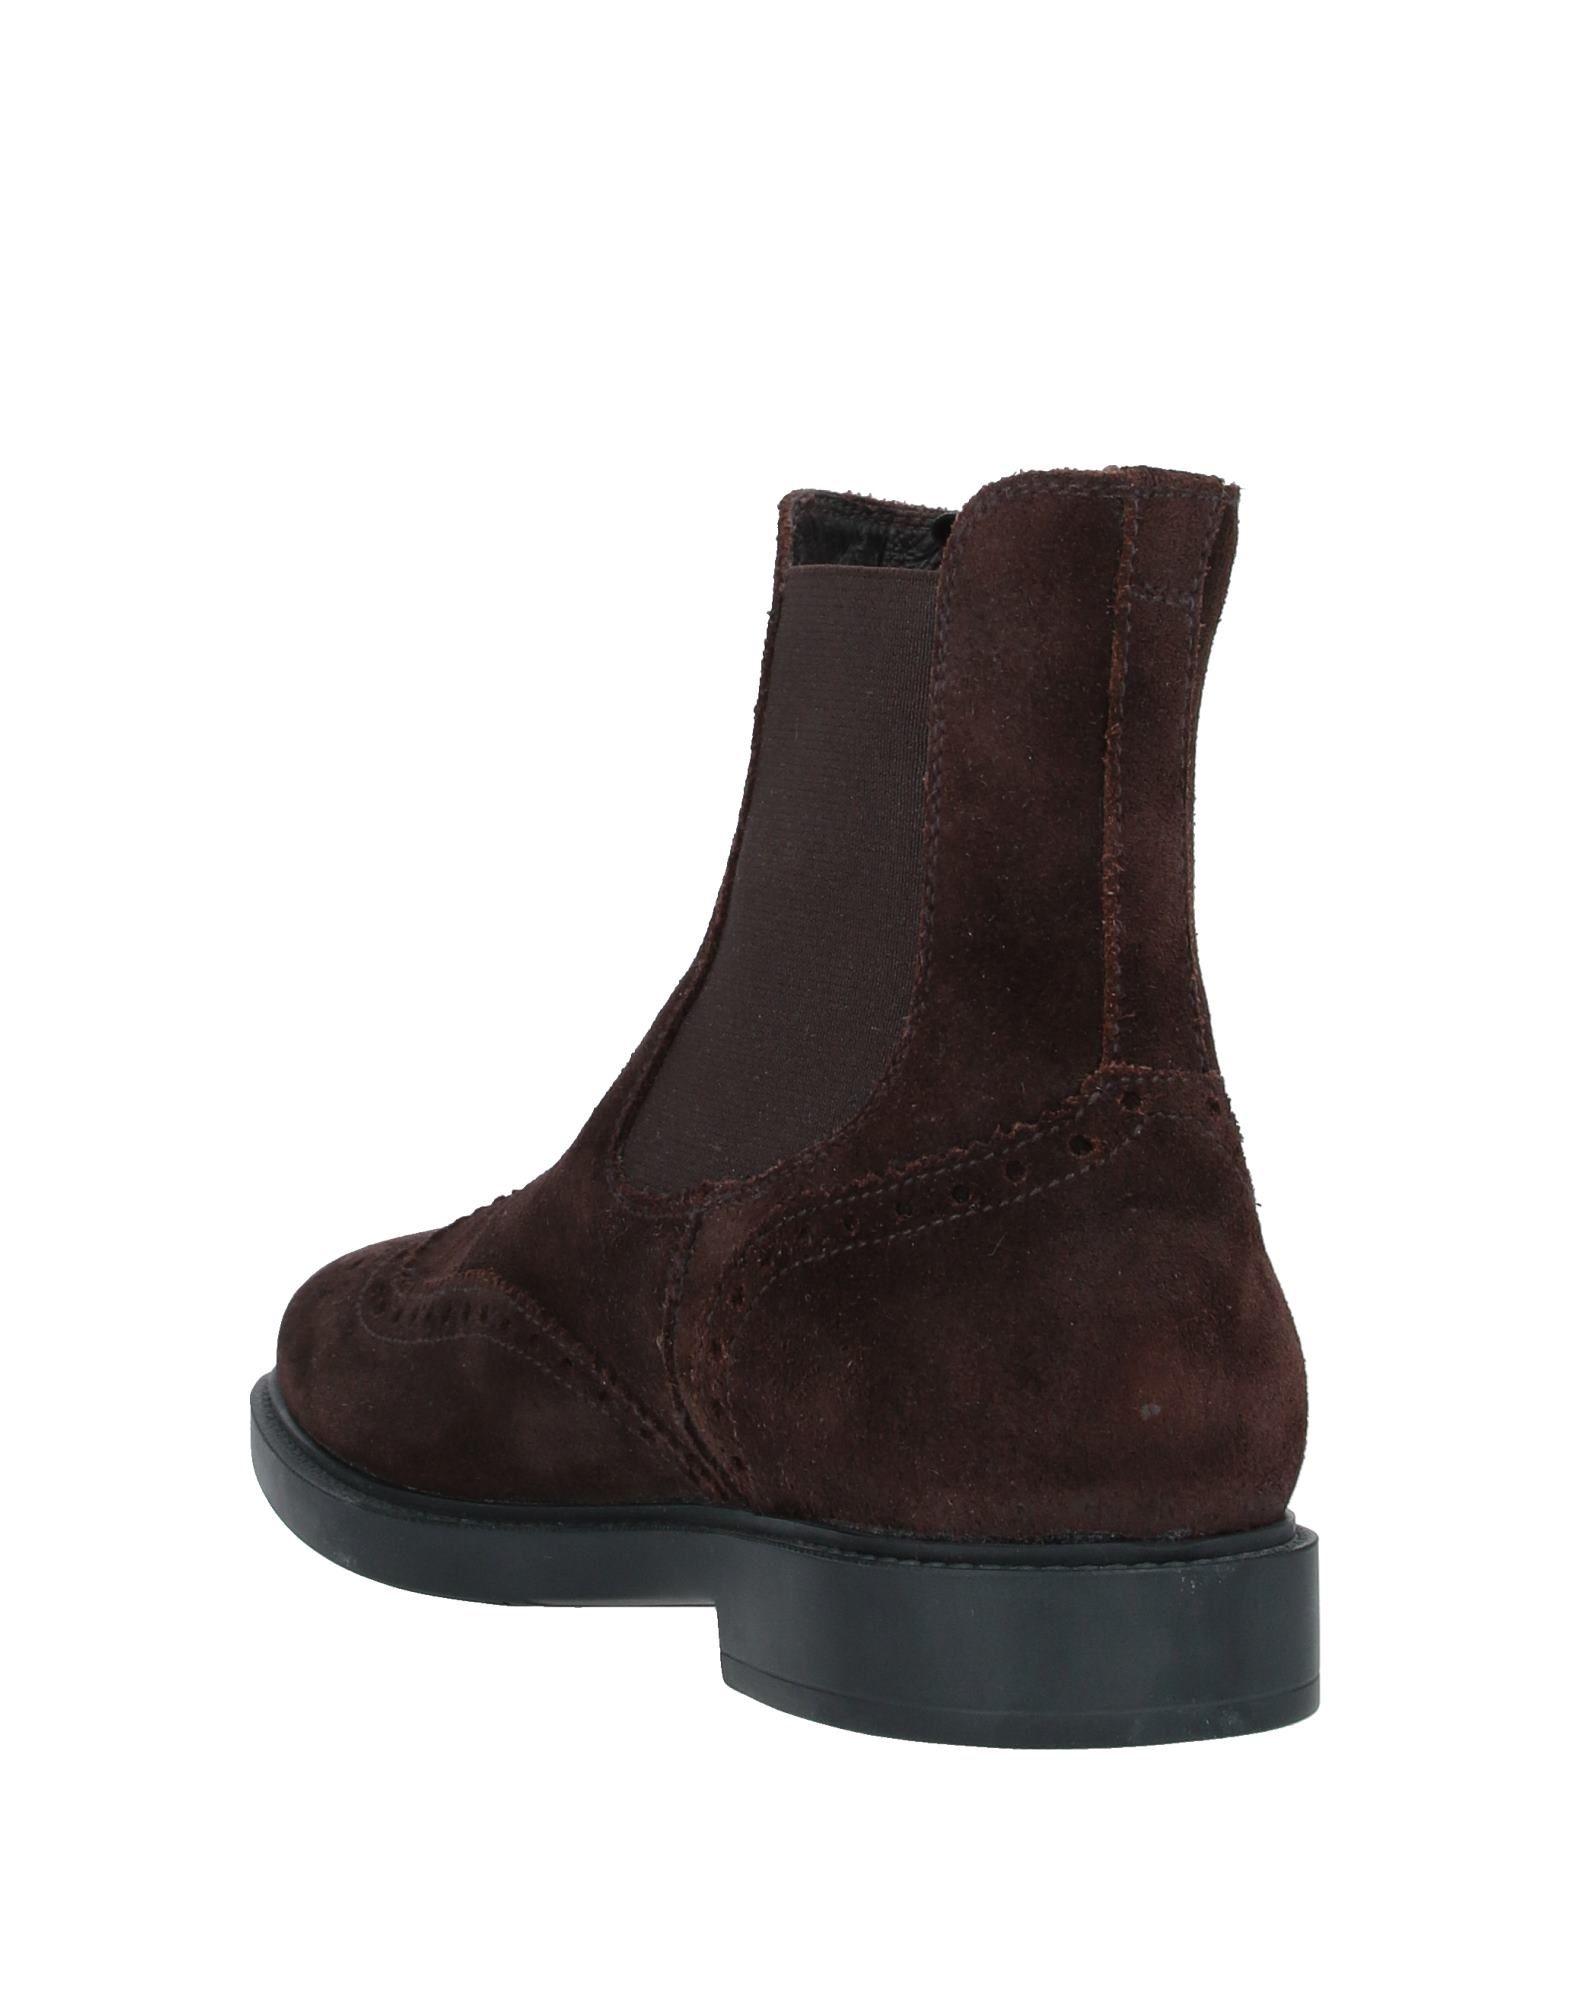 Fratelli Rossetti Gute Stiefelette Herren  11514232DG Gute Rossetti Qualität beliebte Schuhe 3ba18a